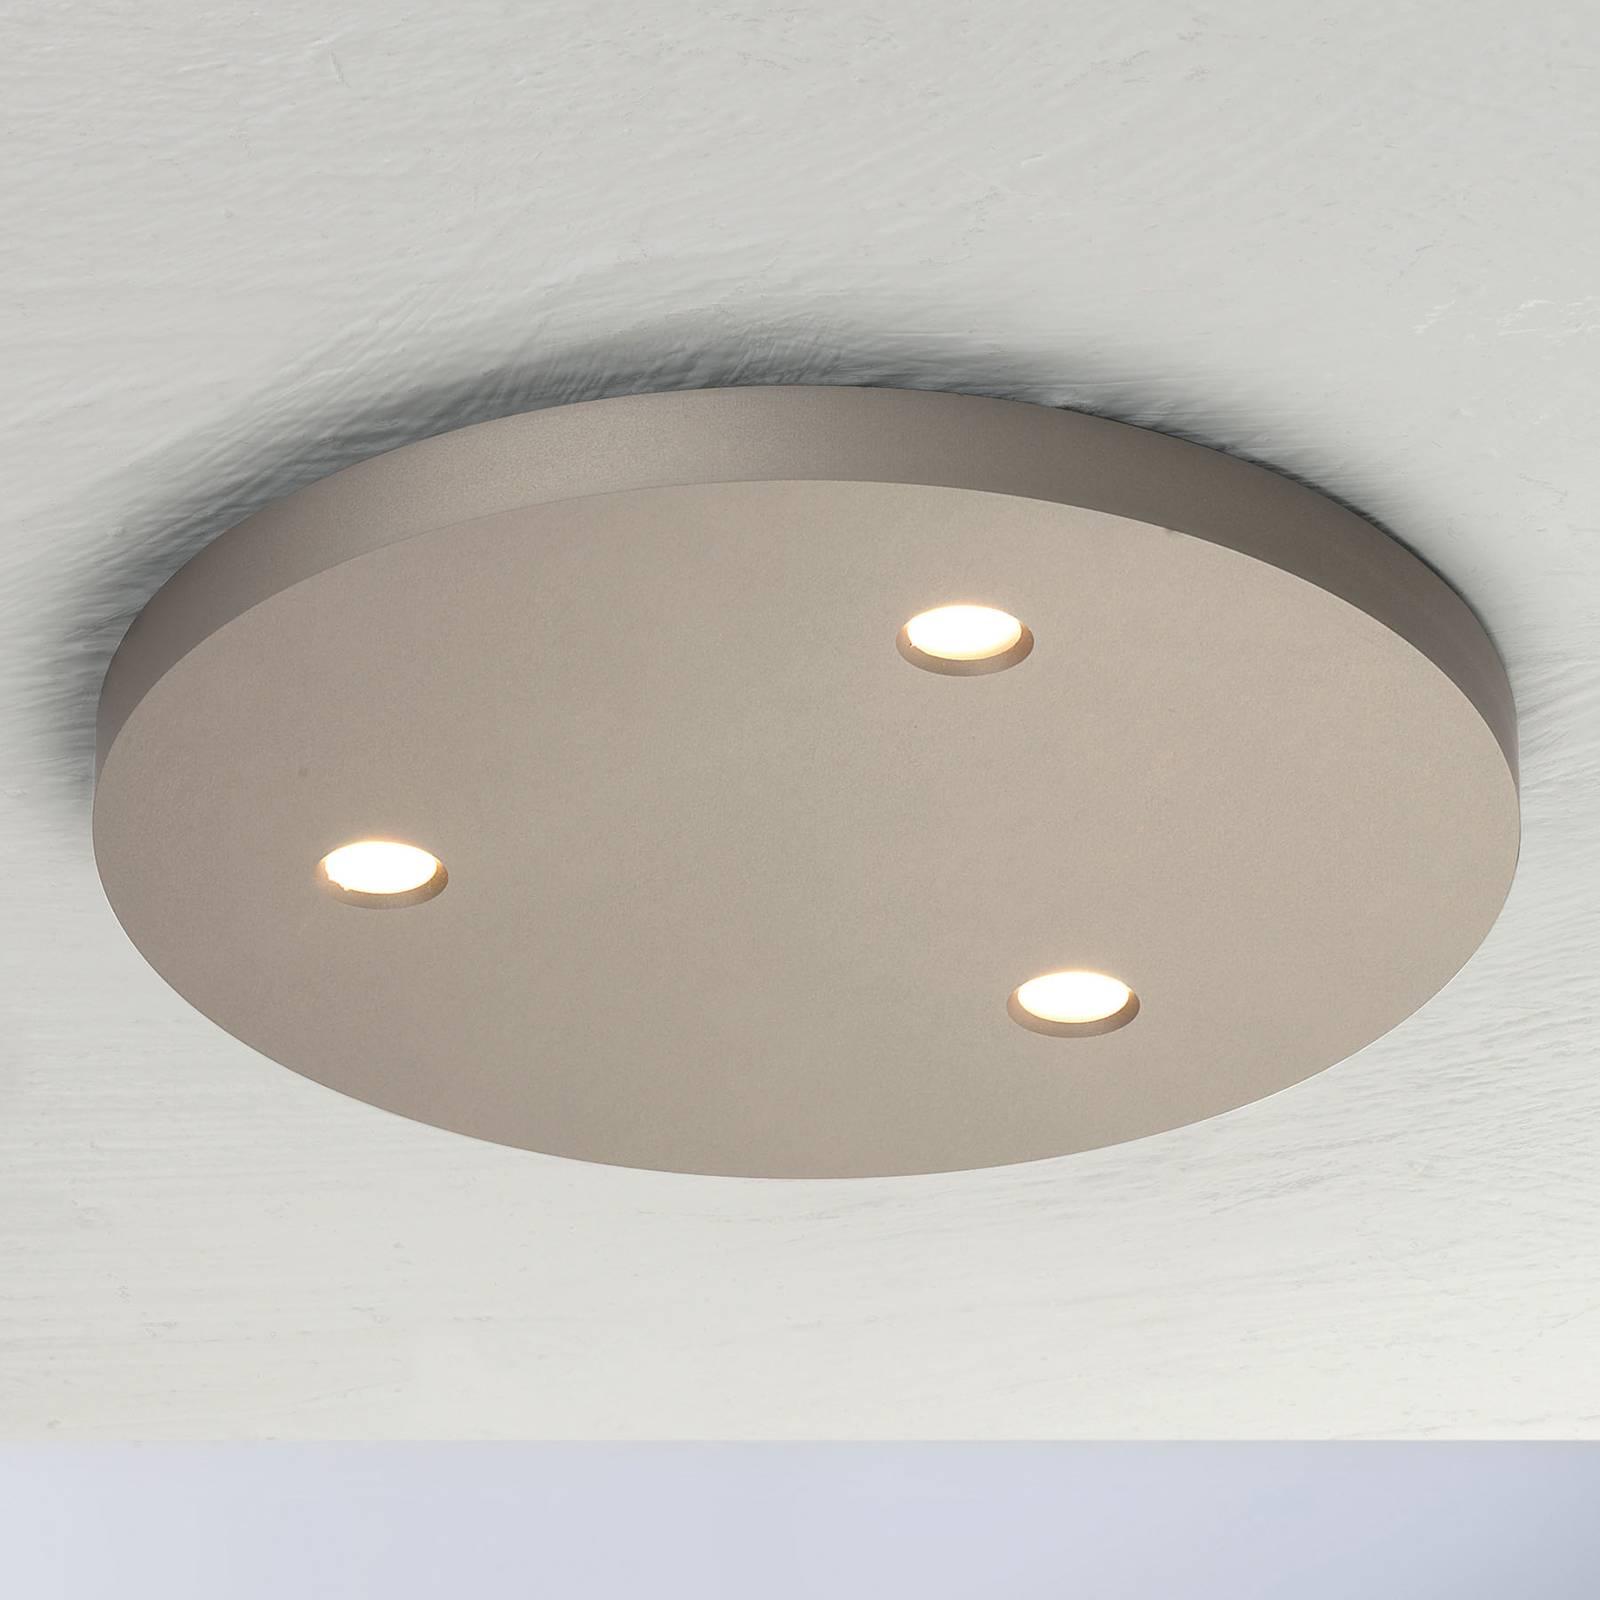 Bopp Close LED plafondlamp 3-lamps rond taupe